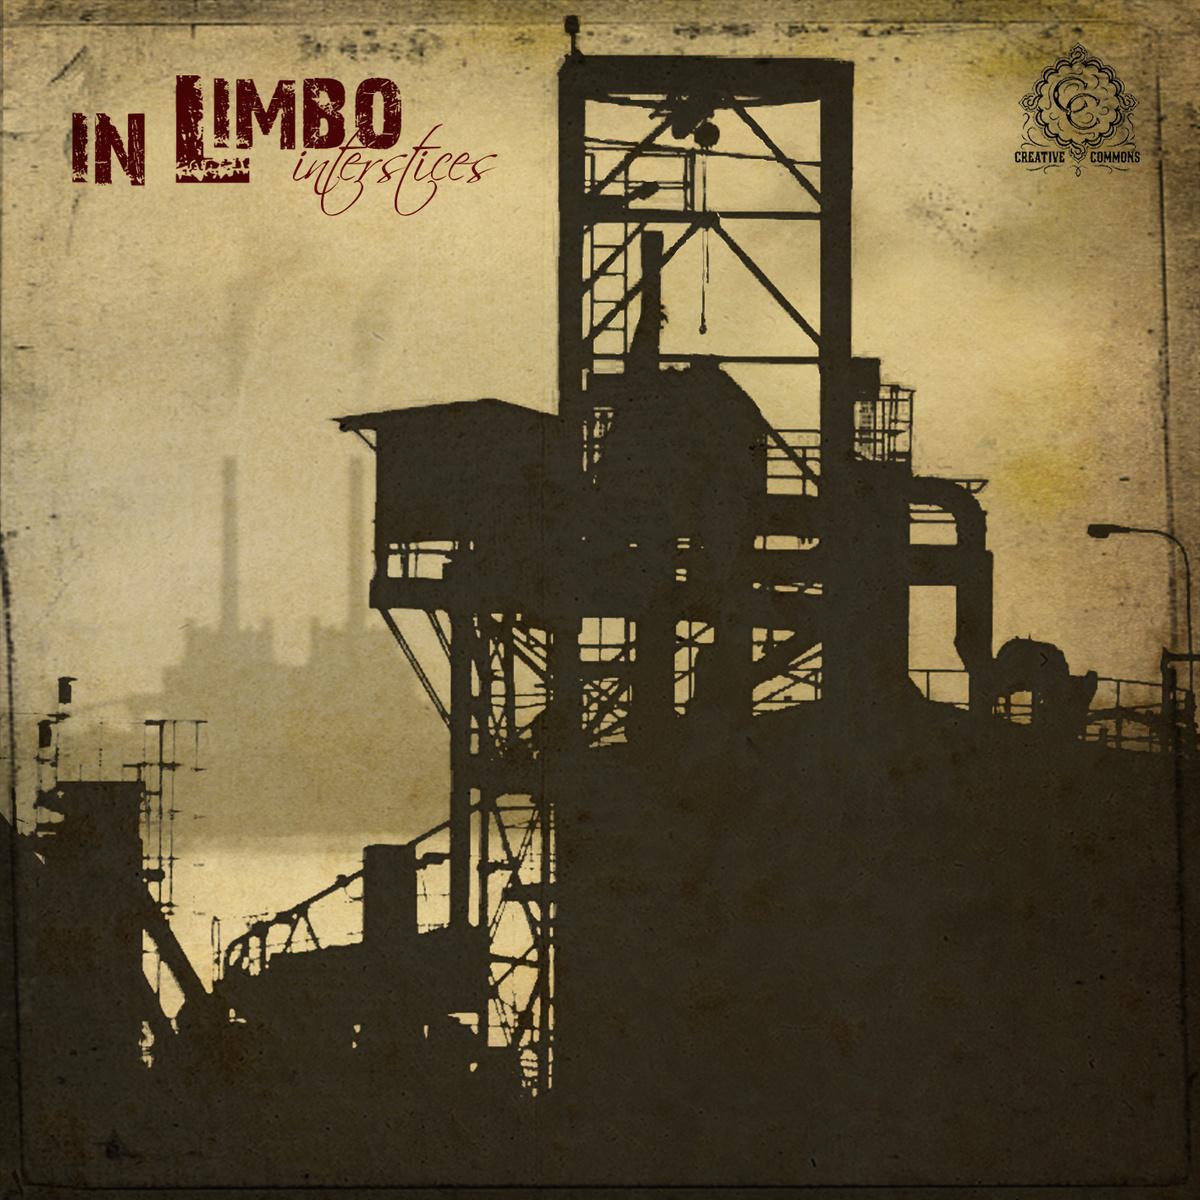 In Limbo: Interstices